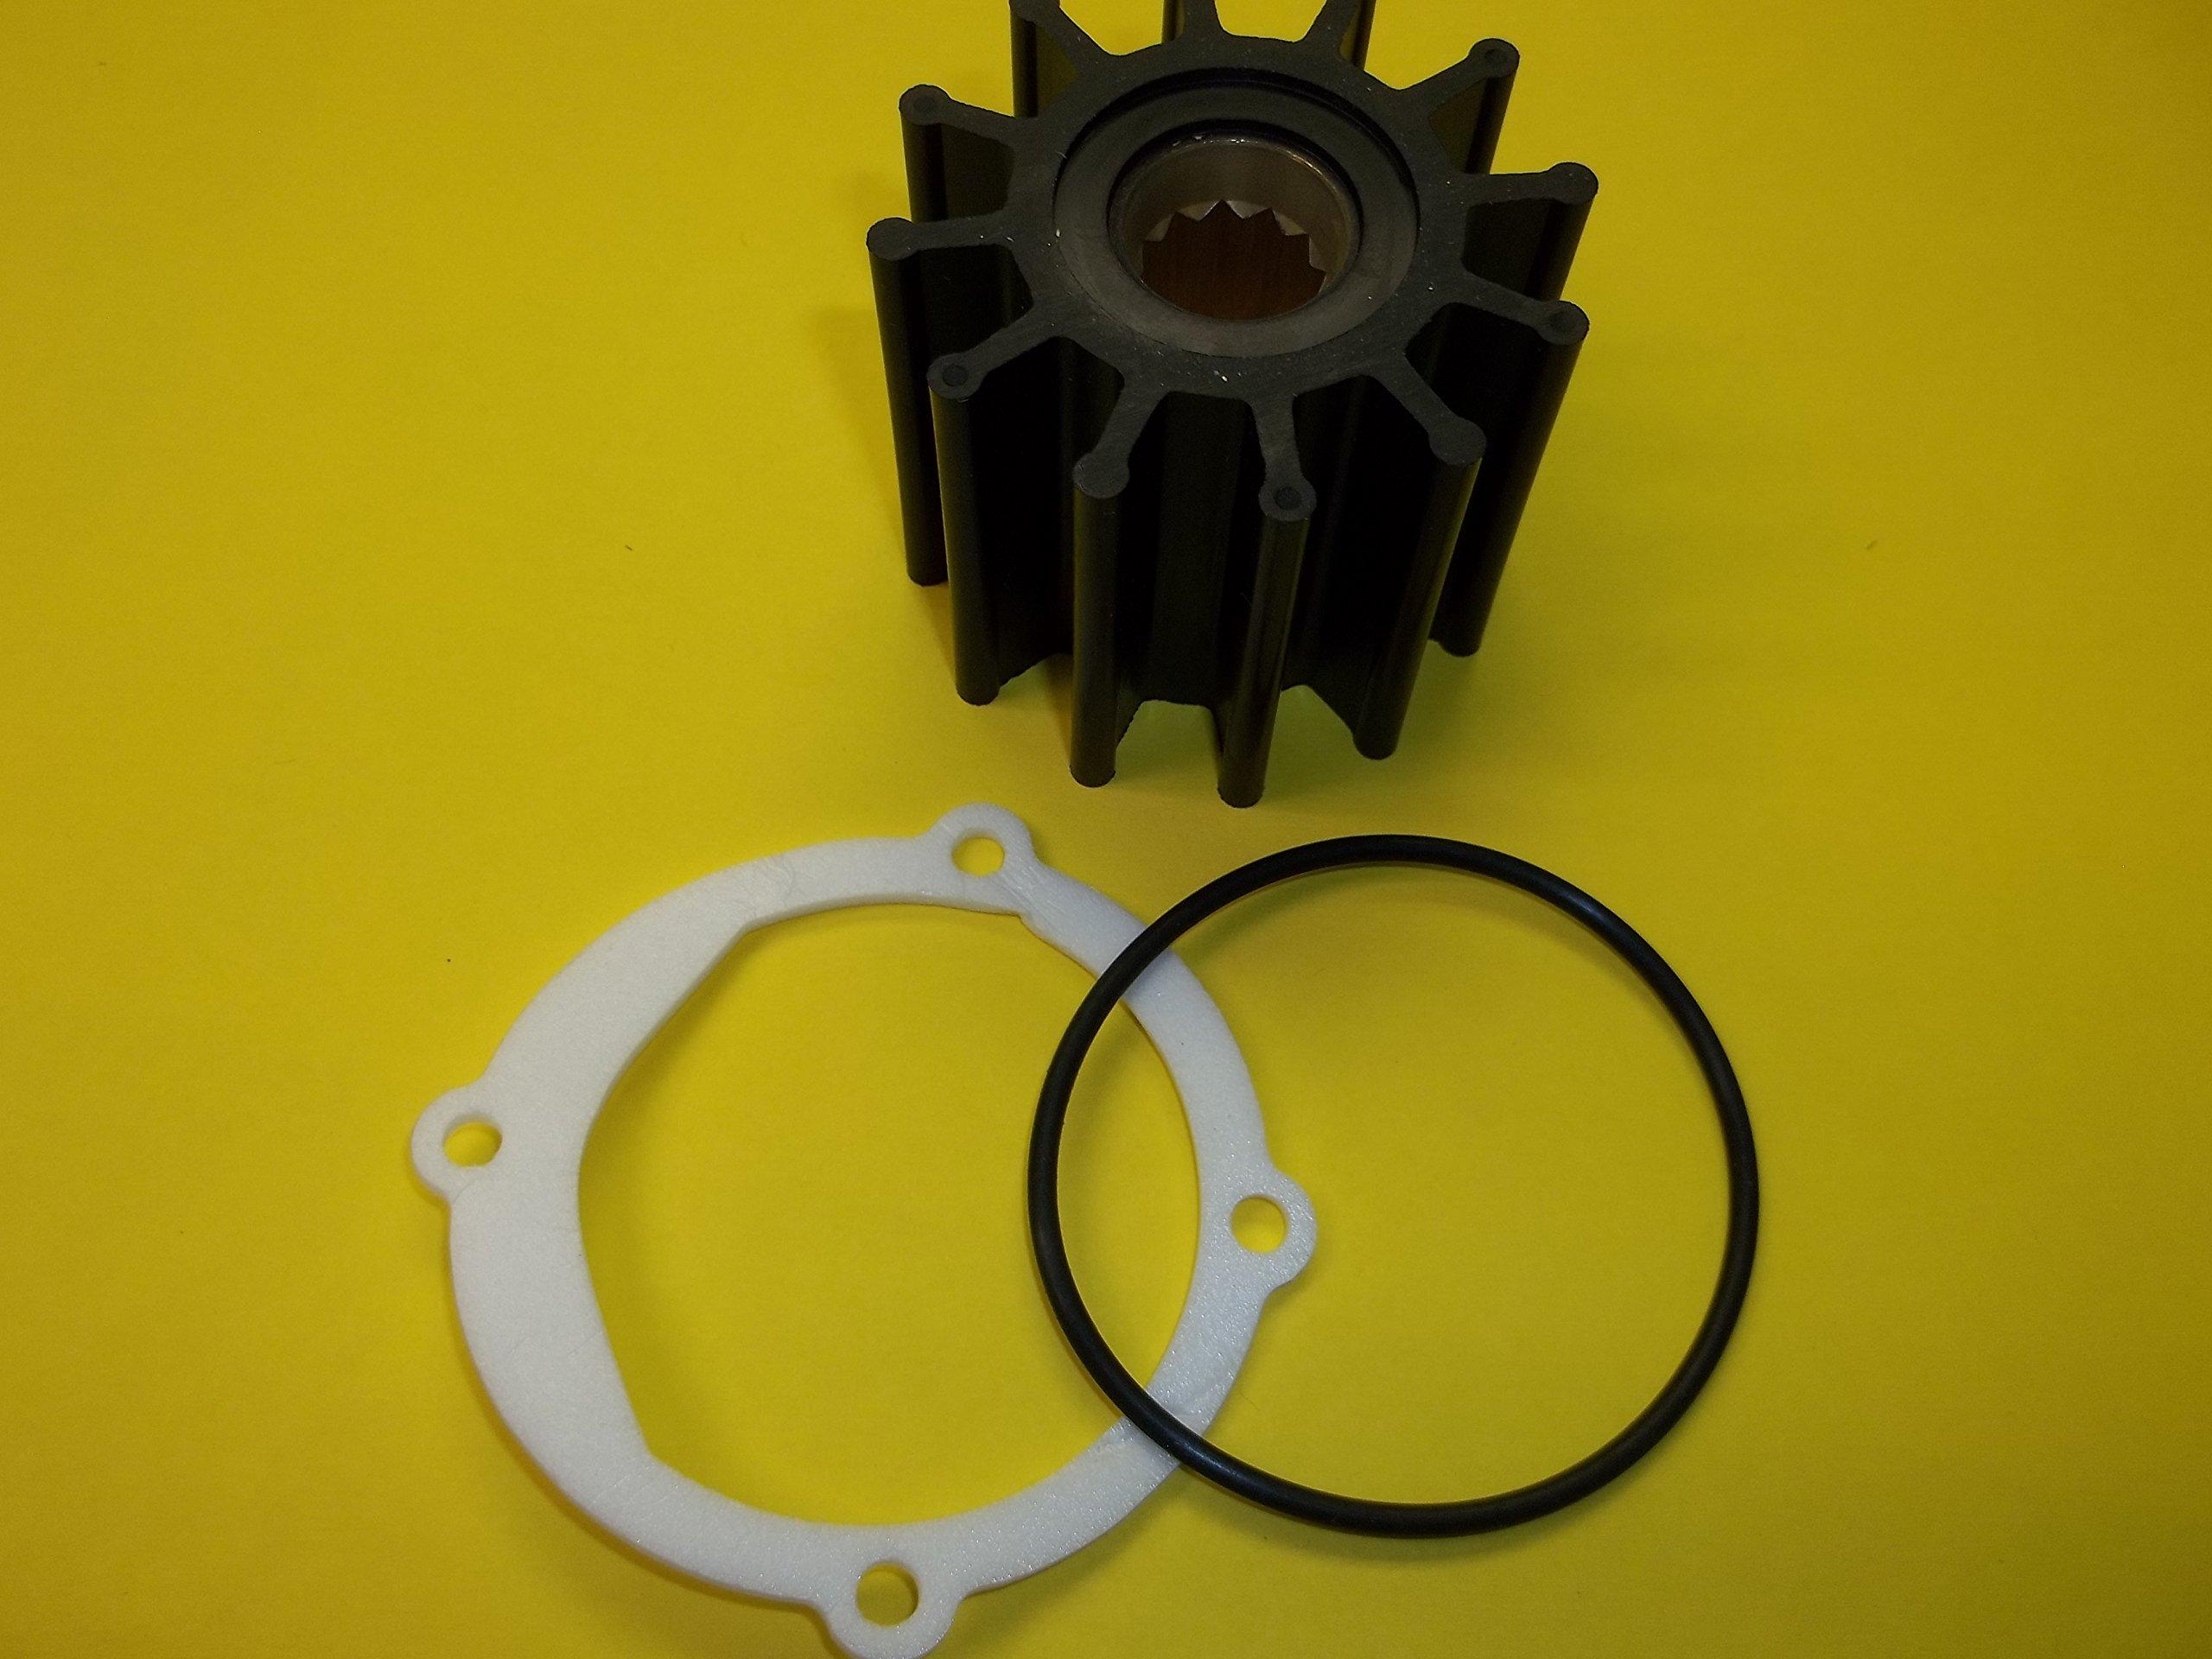 Water pump impeller for Volvo Penta 3.0 4.3 5.0 5.7 8.1 V6 V8 engines. Johnson F6B-9 09-812B and Indmar